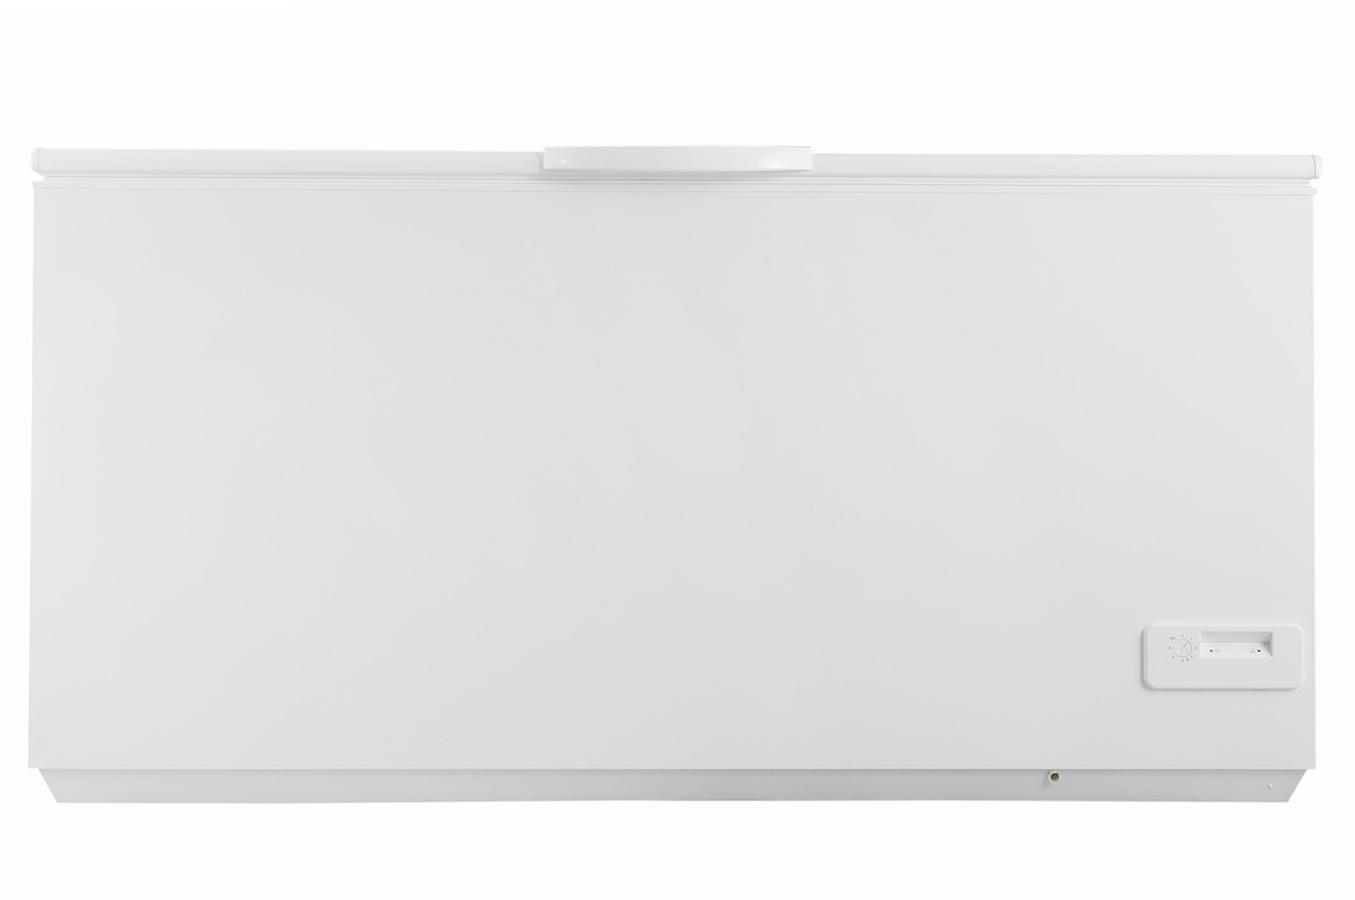 cong lateur coffre faure ffc51400wa 4127960 darty. Black Bedroom Furniture Sets. Home Design Ideas